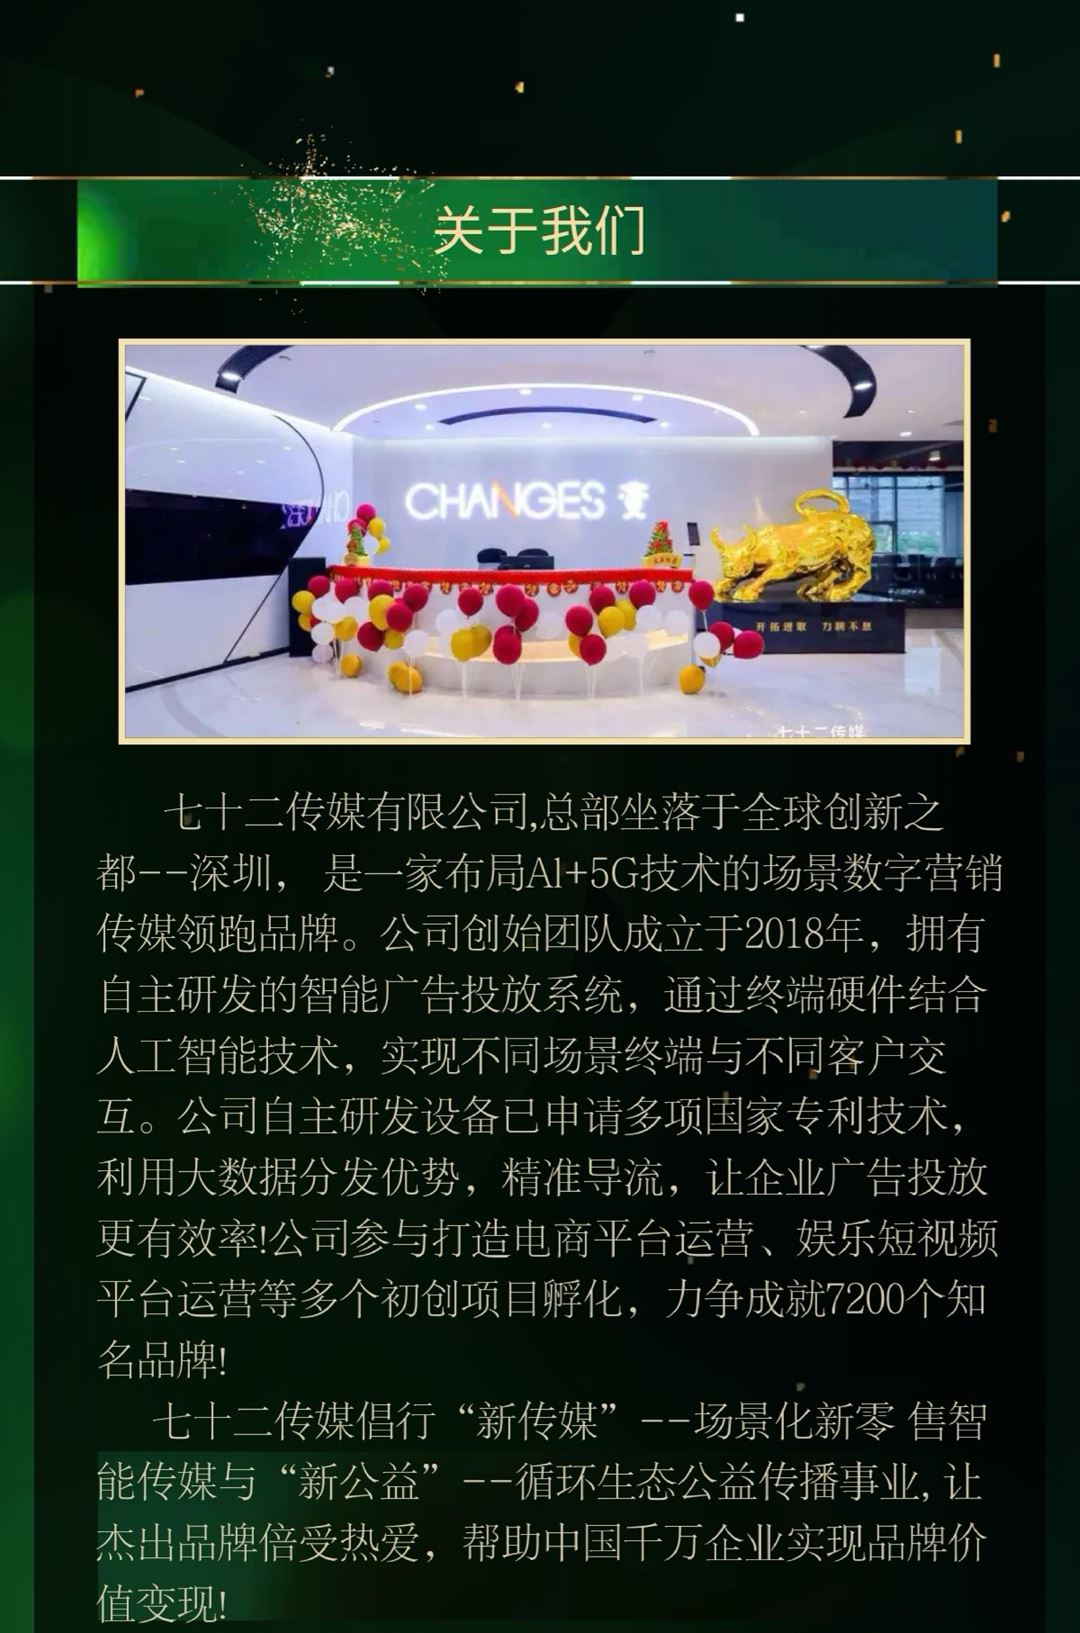 http://www.huodongxing.com/file/20180527/5423068656966/894214892536369.jpg